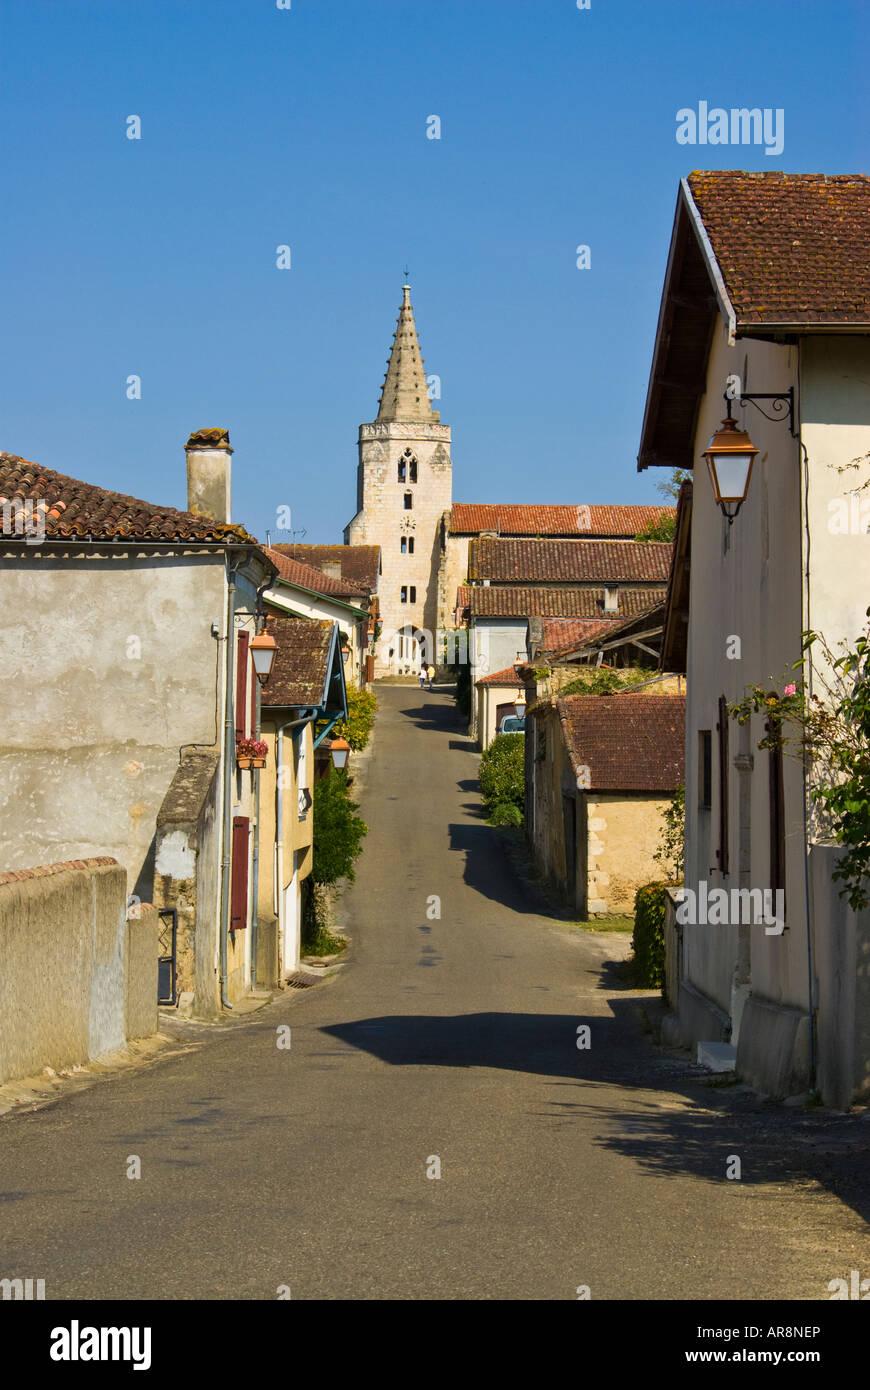 Main street, Brassempouy, Landes, France Photo Stock